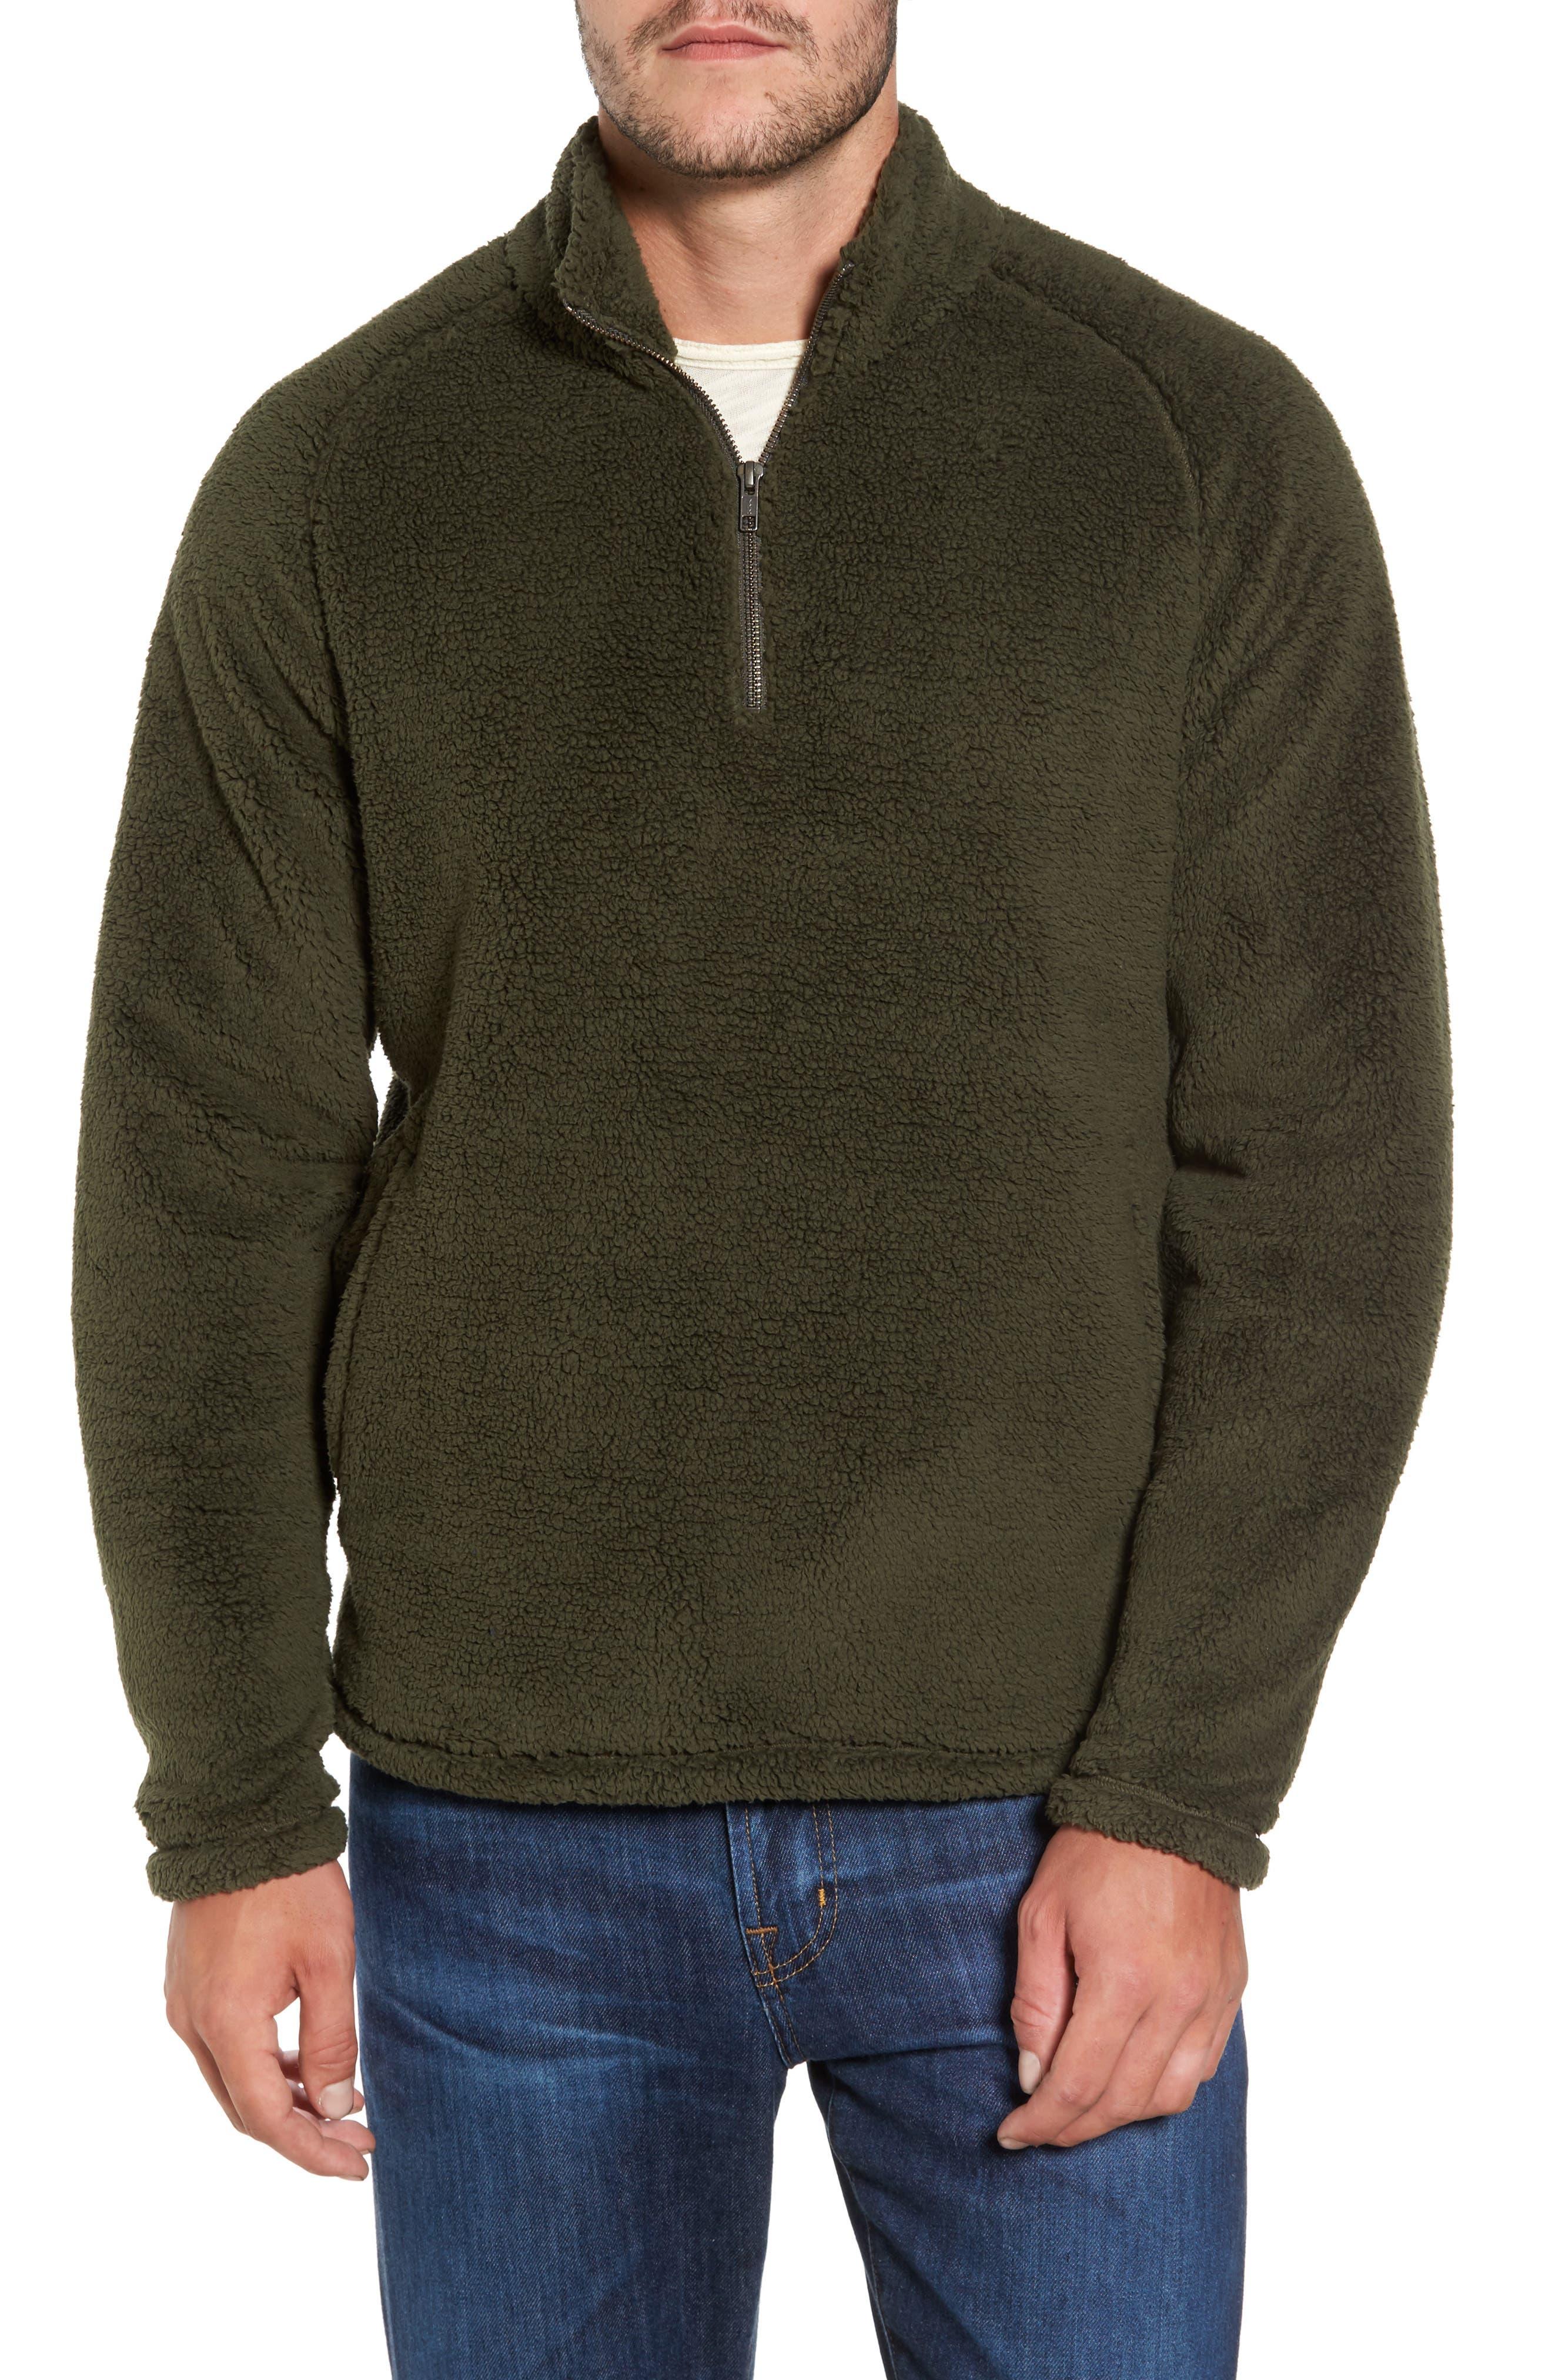 Nordstrom Men's Shop Polar Fleece Quarter Zip Pullover